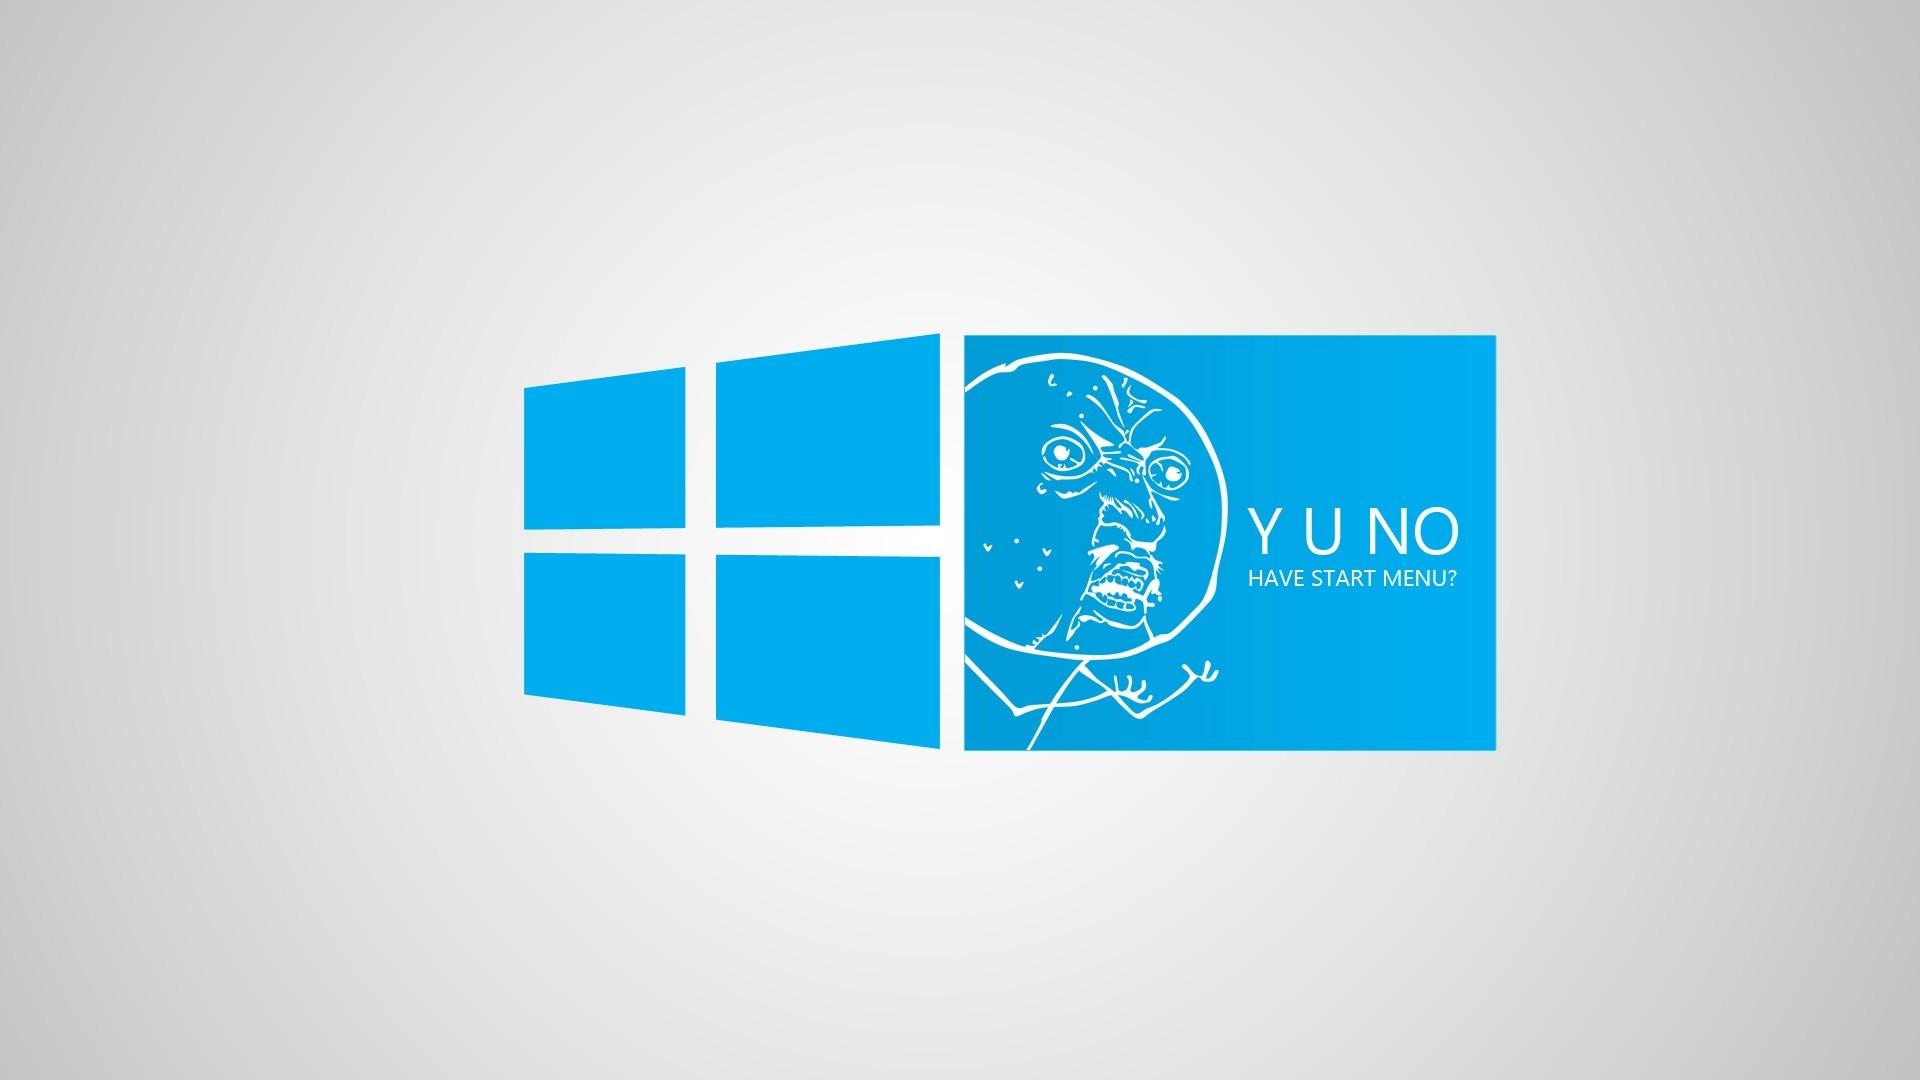 Funny Blue Windows 8 Meme Resolution